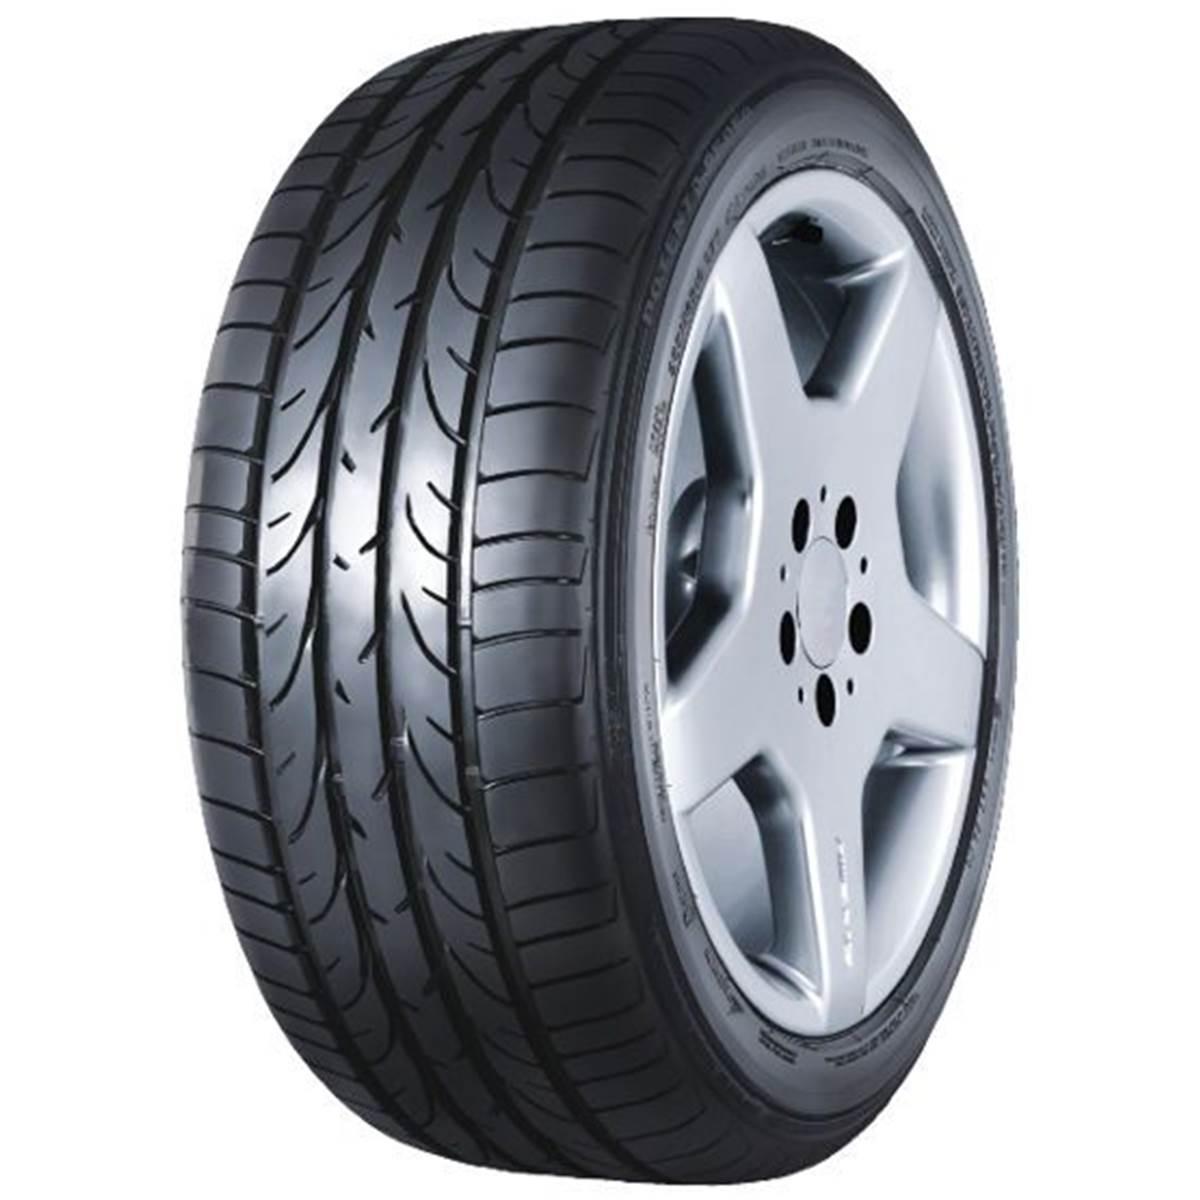 Pneu Bridgestone 285/35R18 97W Potenza Re050